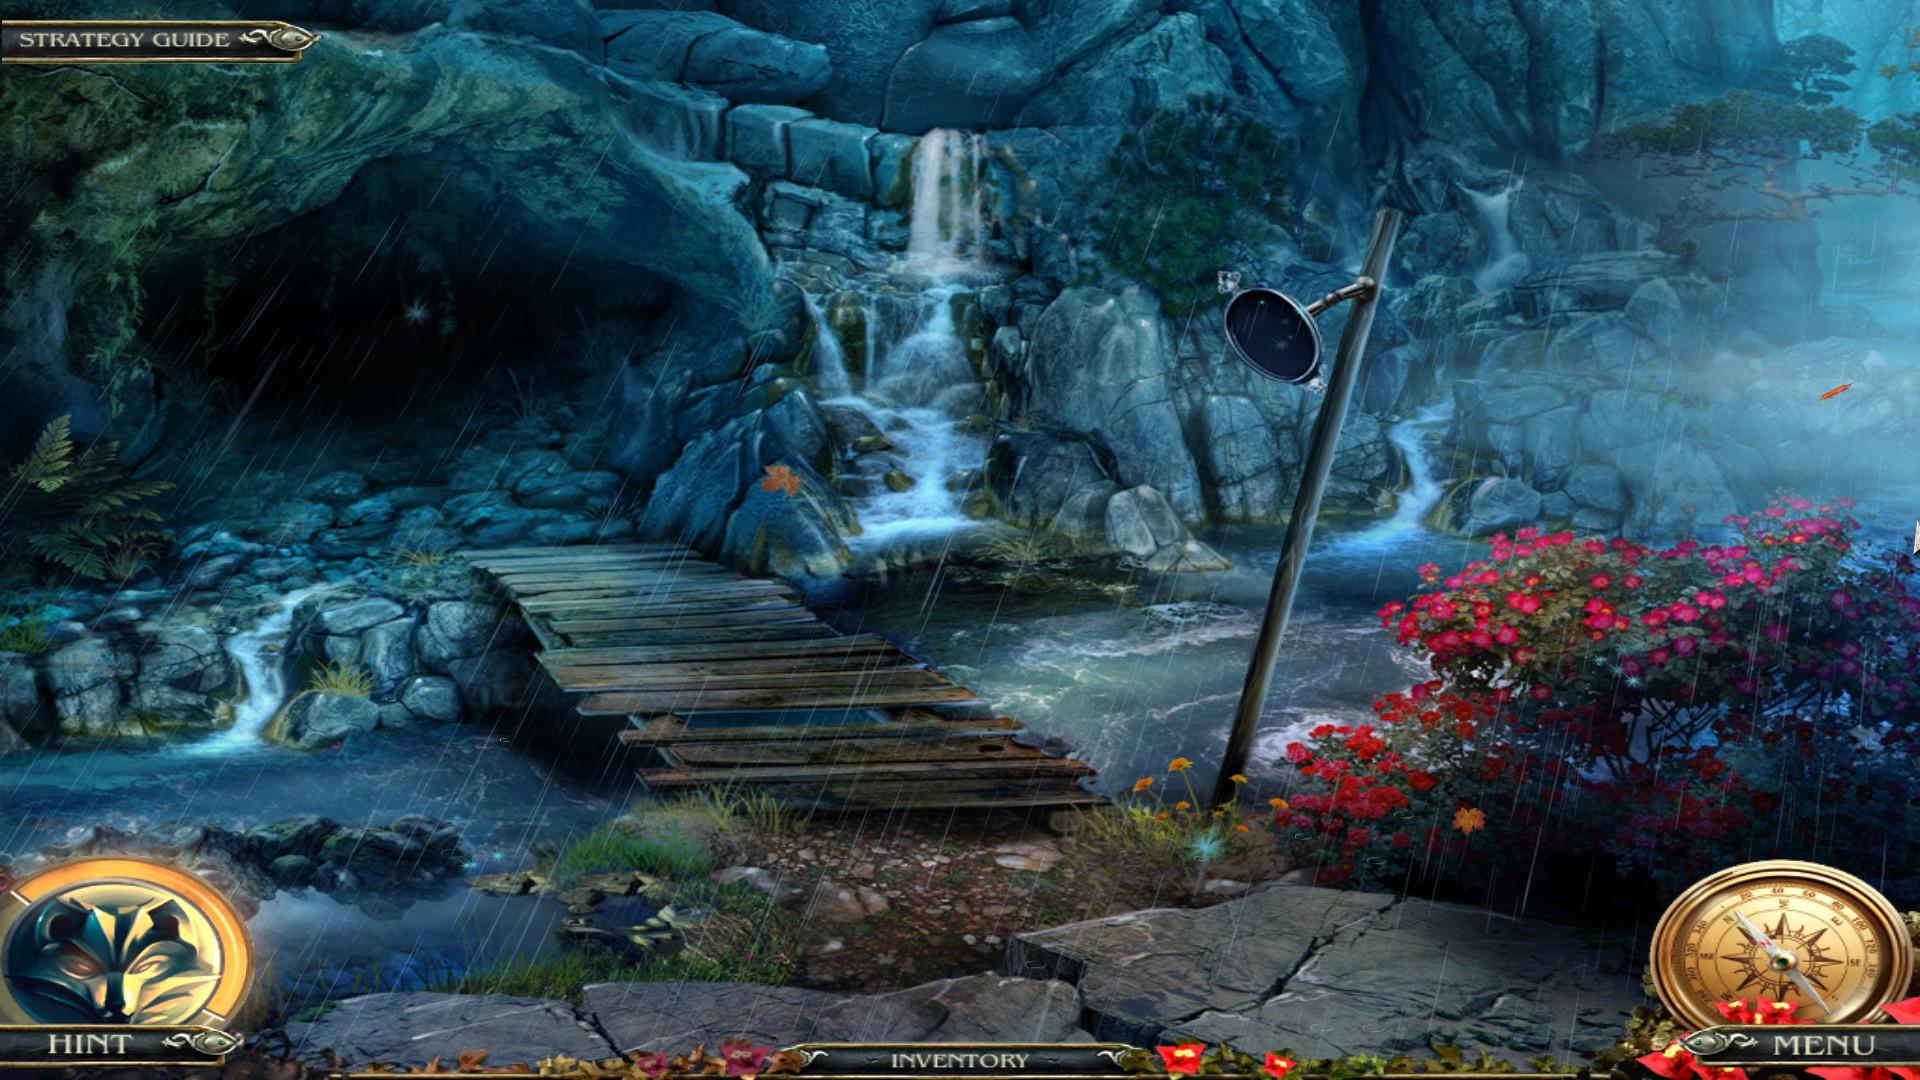 Grim Tales 2: The Legacy 62B2E079ABCADEFAB0D6C130A15E63F4FDF69D9F